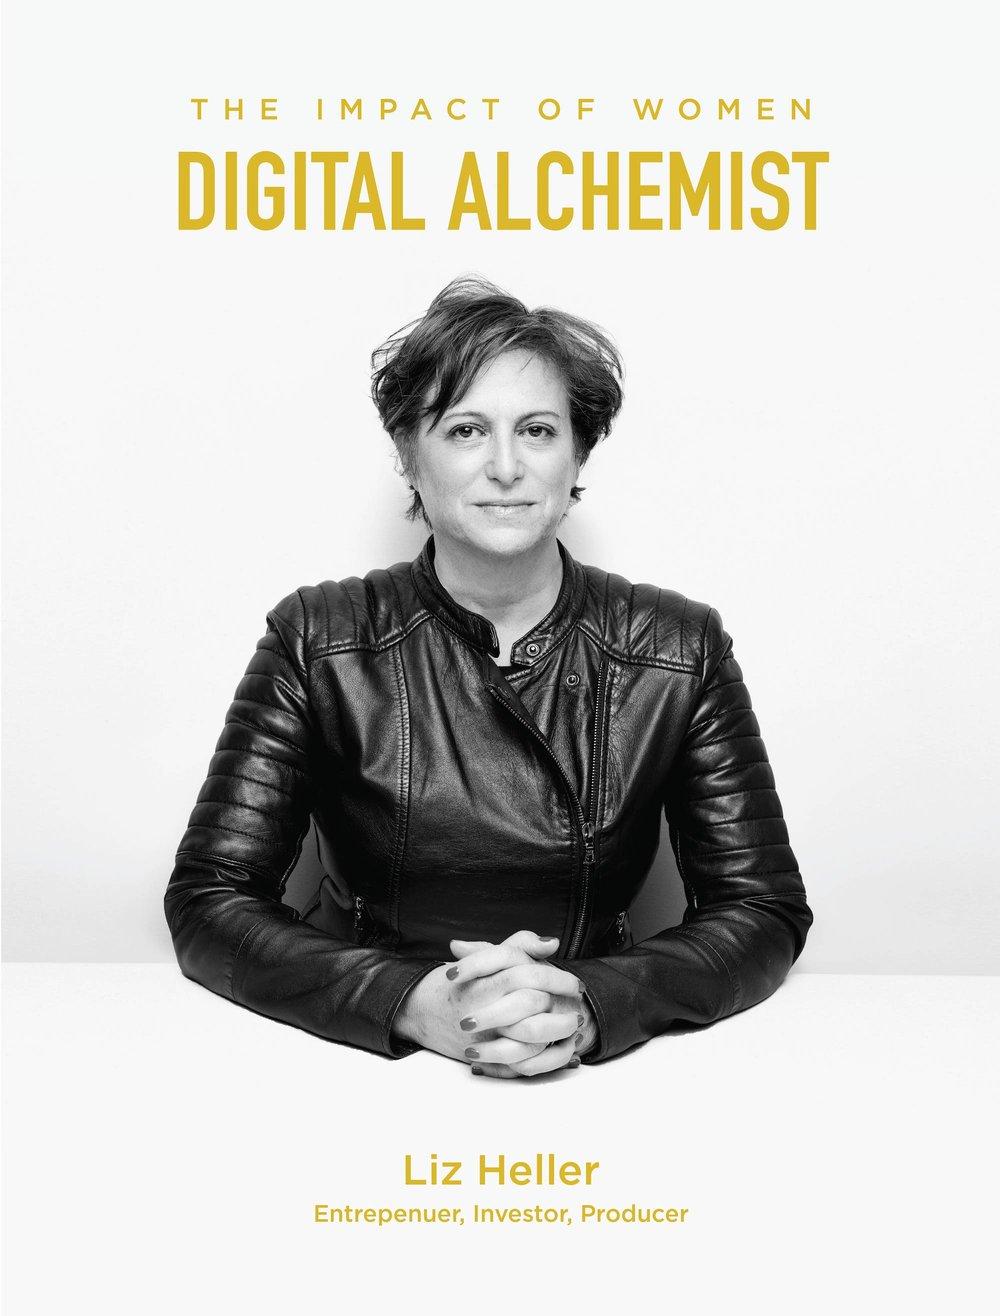 Liz Heller is a Digital alchemist